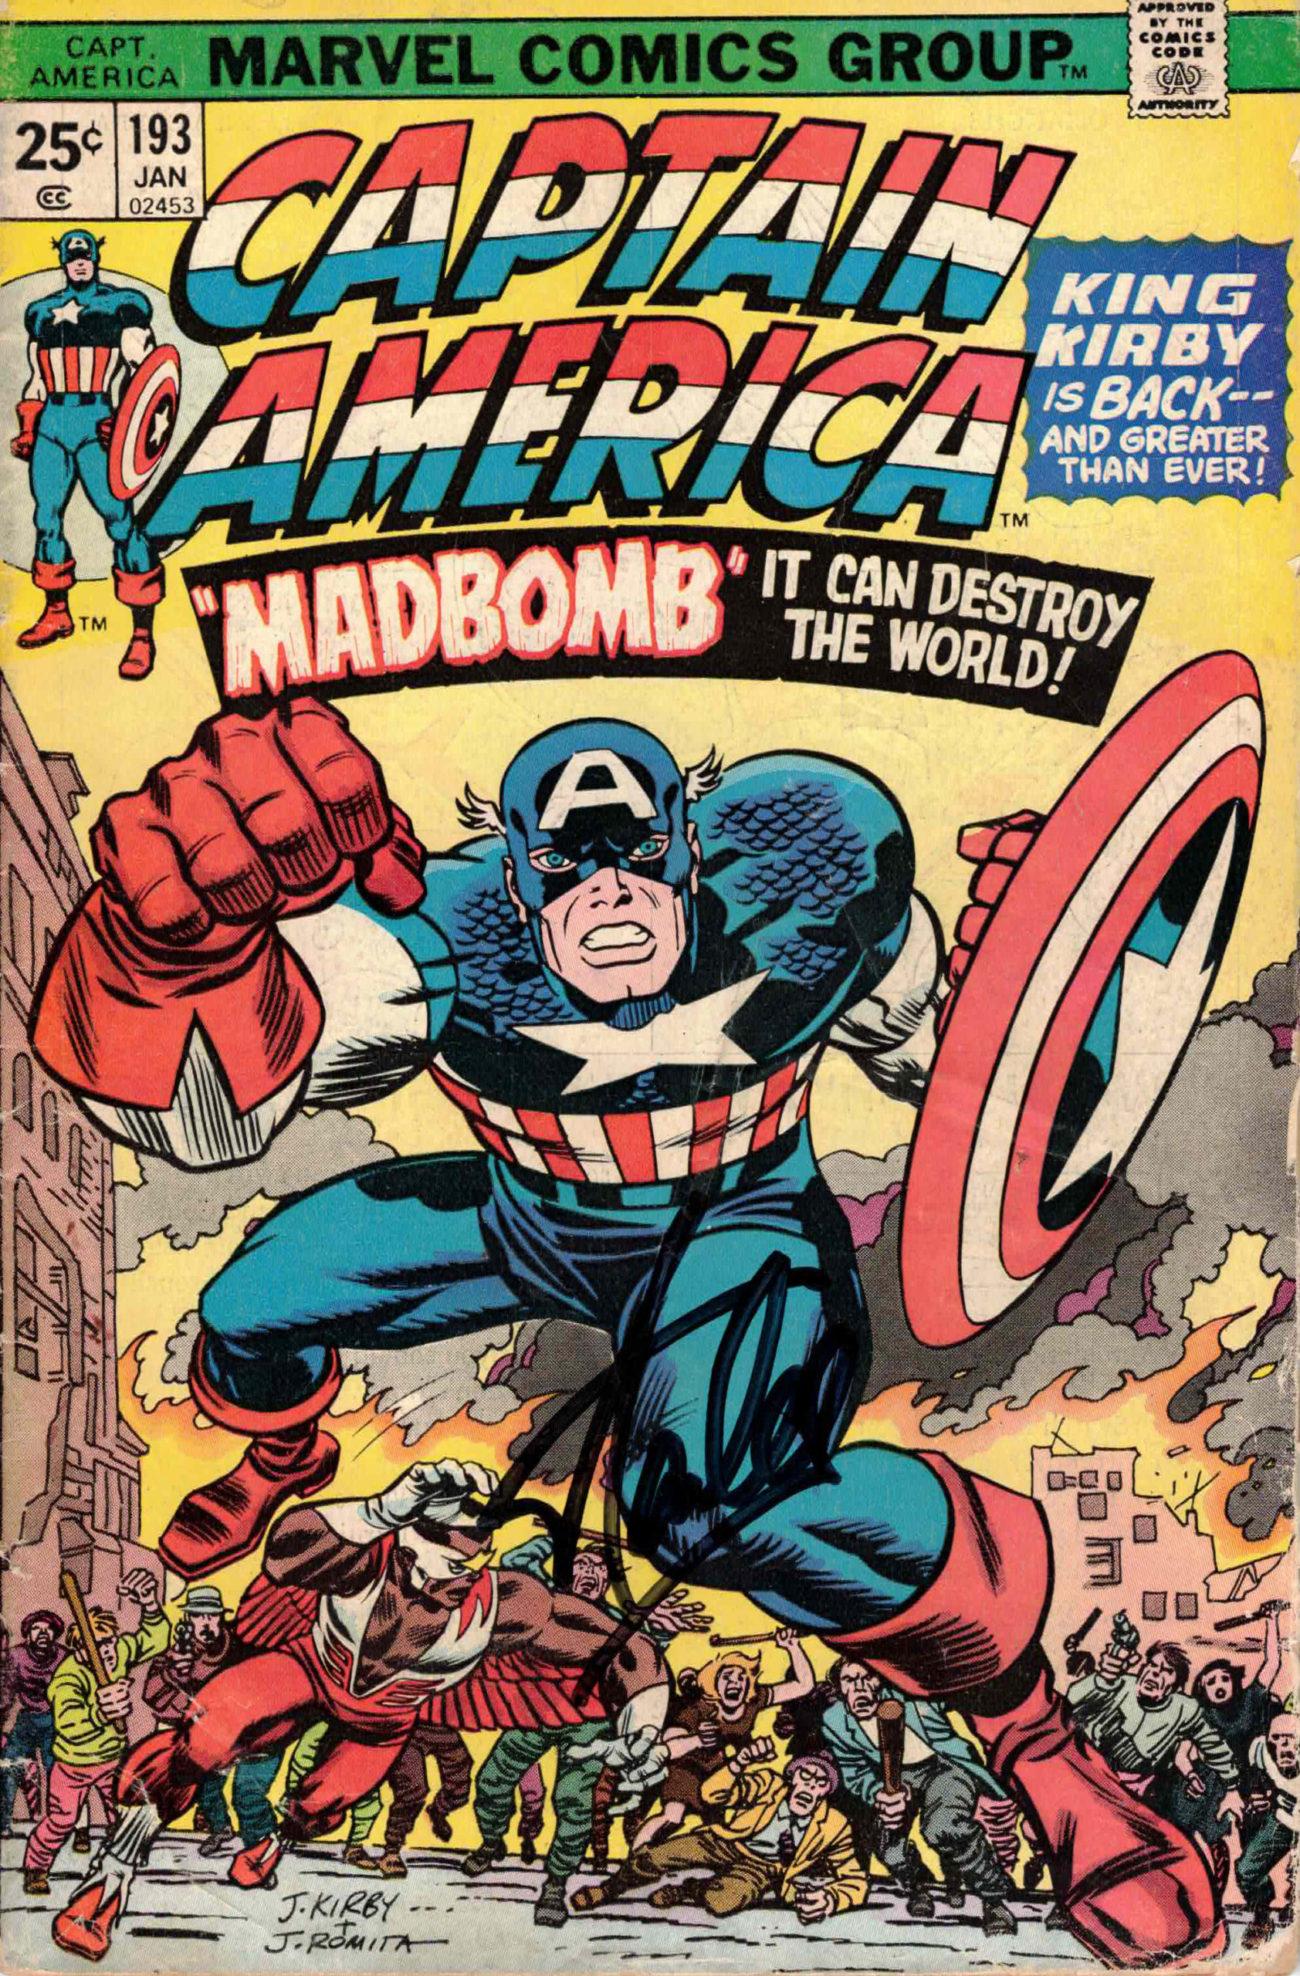 Stan Lee / CAPTAIN AMERICA komiks, celý sešit - autogram (JAN 1975)